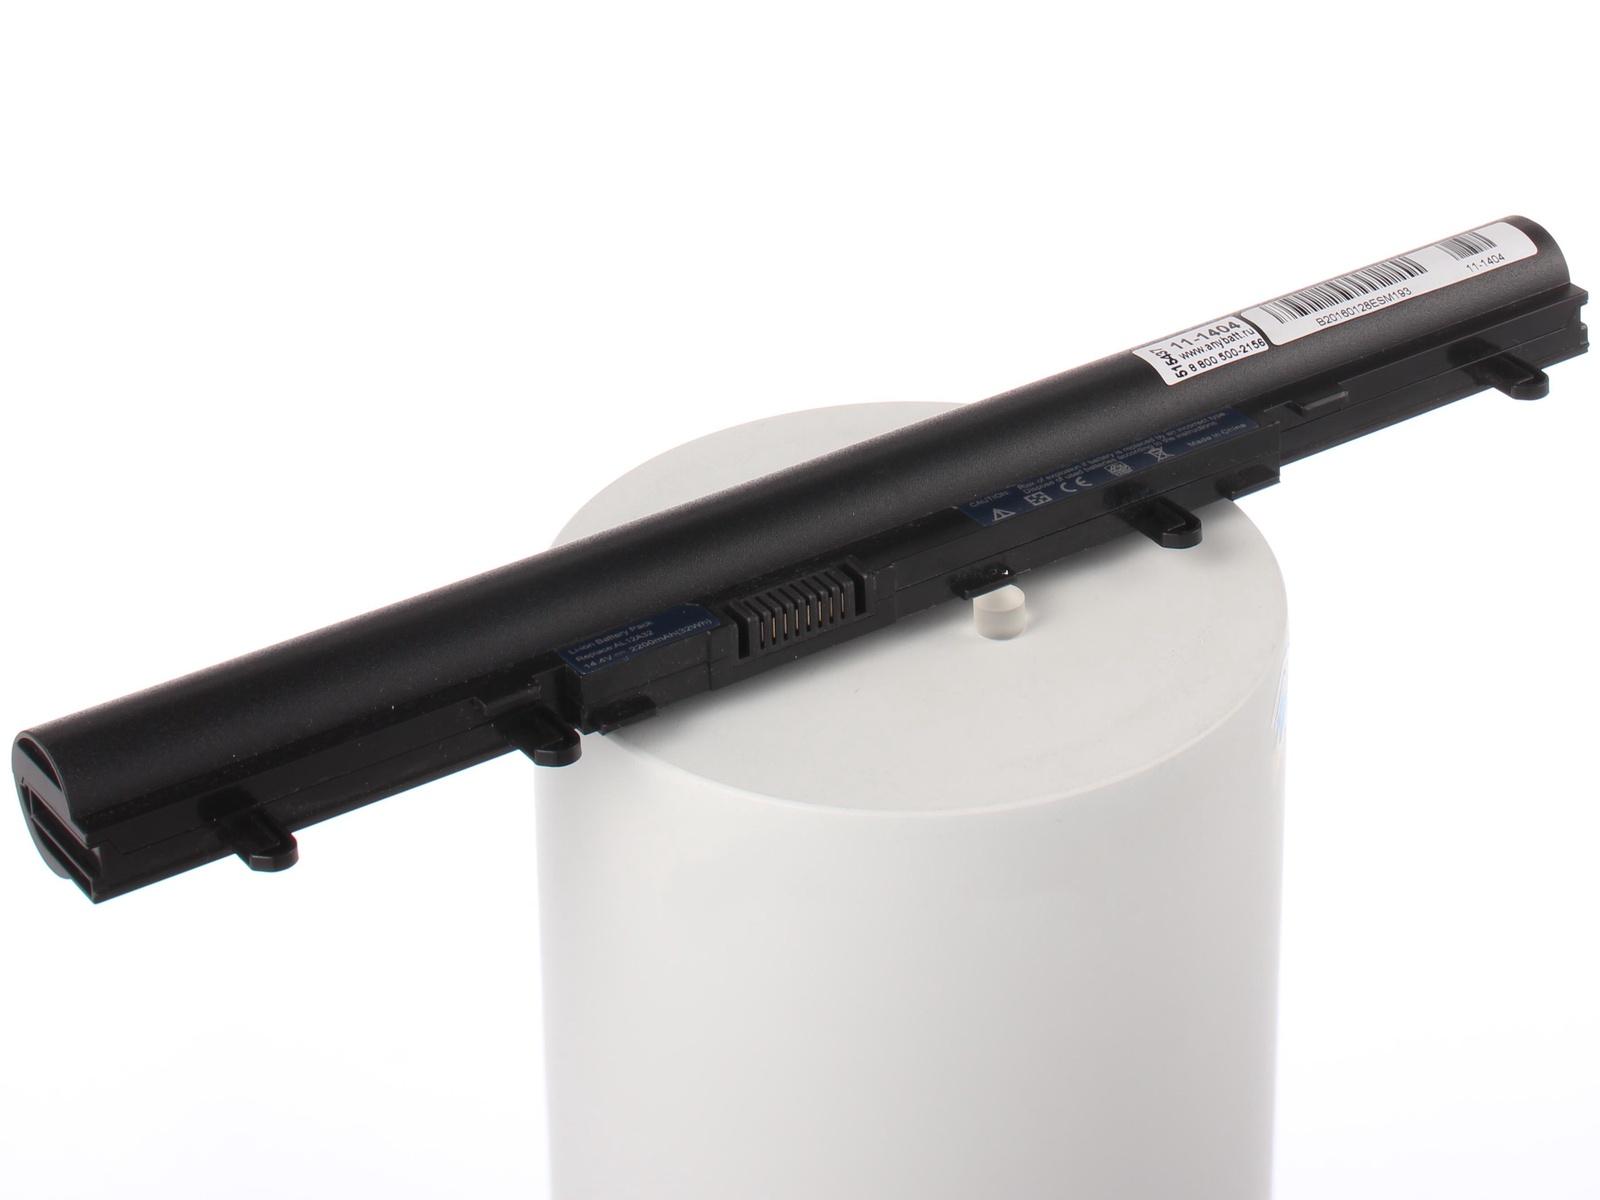 Аккумулятор для ноутбука AnyBatt для Acer Aspire E1-570G-53336G75Mnii, Aspire E1-572G-54206G75Mnkk, ASPIRE F5-571G-59XP, Aspire E1-570G-33214G50Mn, Aspire V5-531G-987B4G50Mass, Aspire V5-571G-53336G50Ma аккумулятор для ноутбука anybatt для acer aspire e1 532g 35584g50mnkk aspire e1 570g 33214g32mnkk aspire v5 571pg 73536g75ma aspire e1 470p 6659 aspire e1 522 12504g50mn aspire e1 522 45004g1tmn aspire e1 570g 33214g50mnii